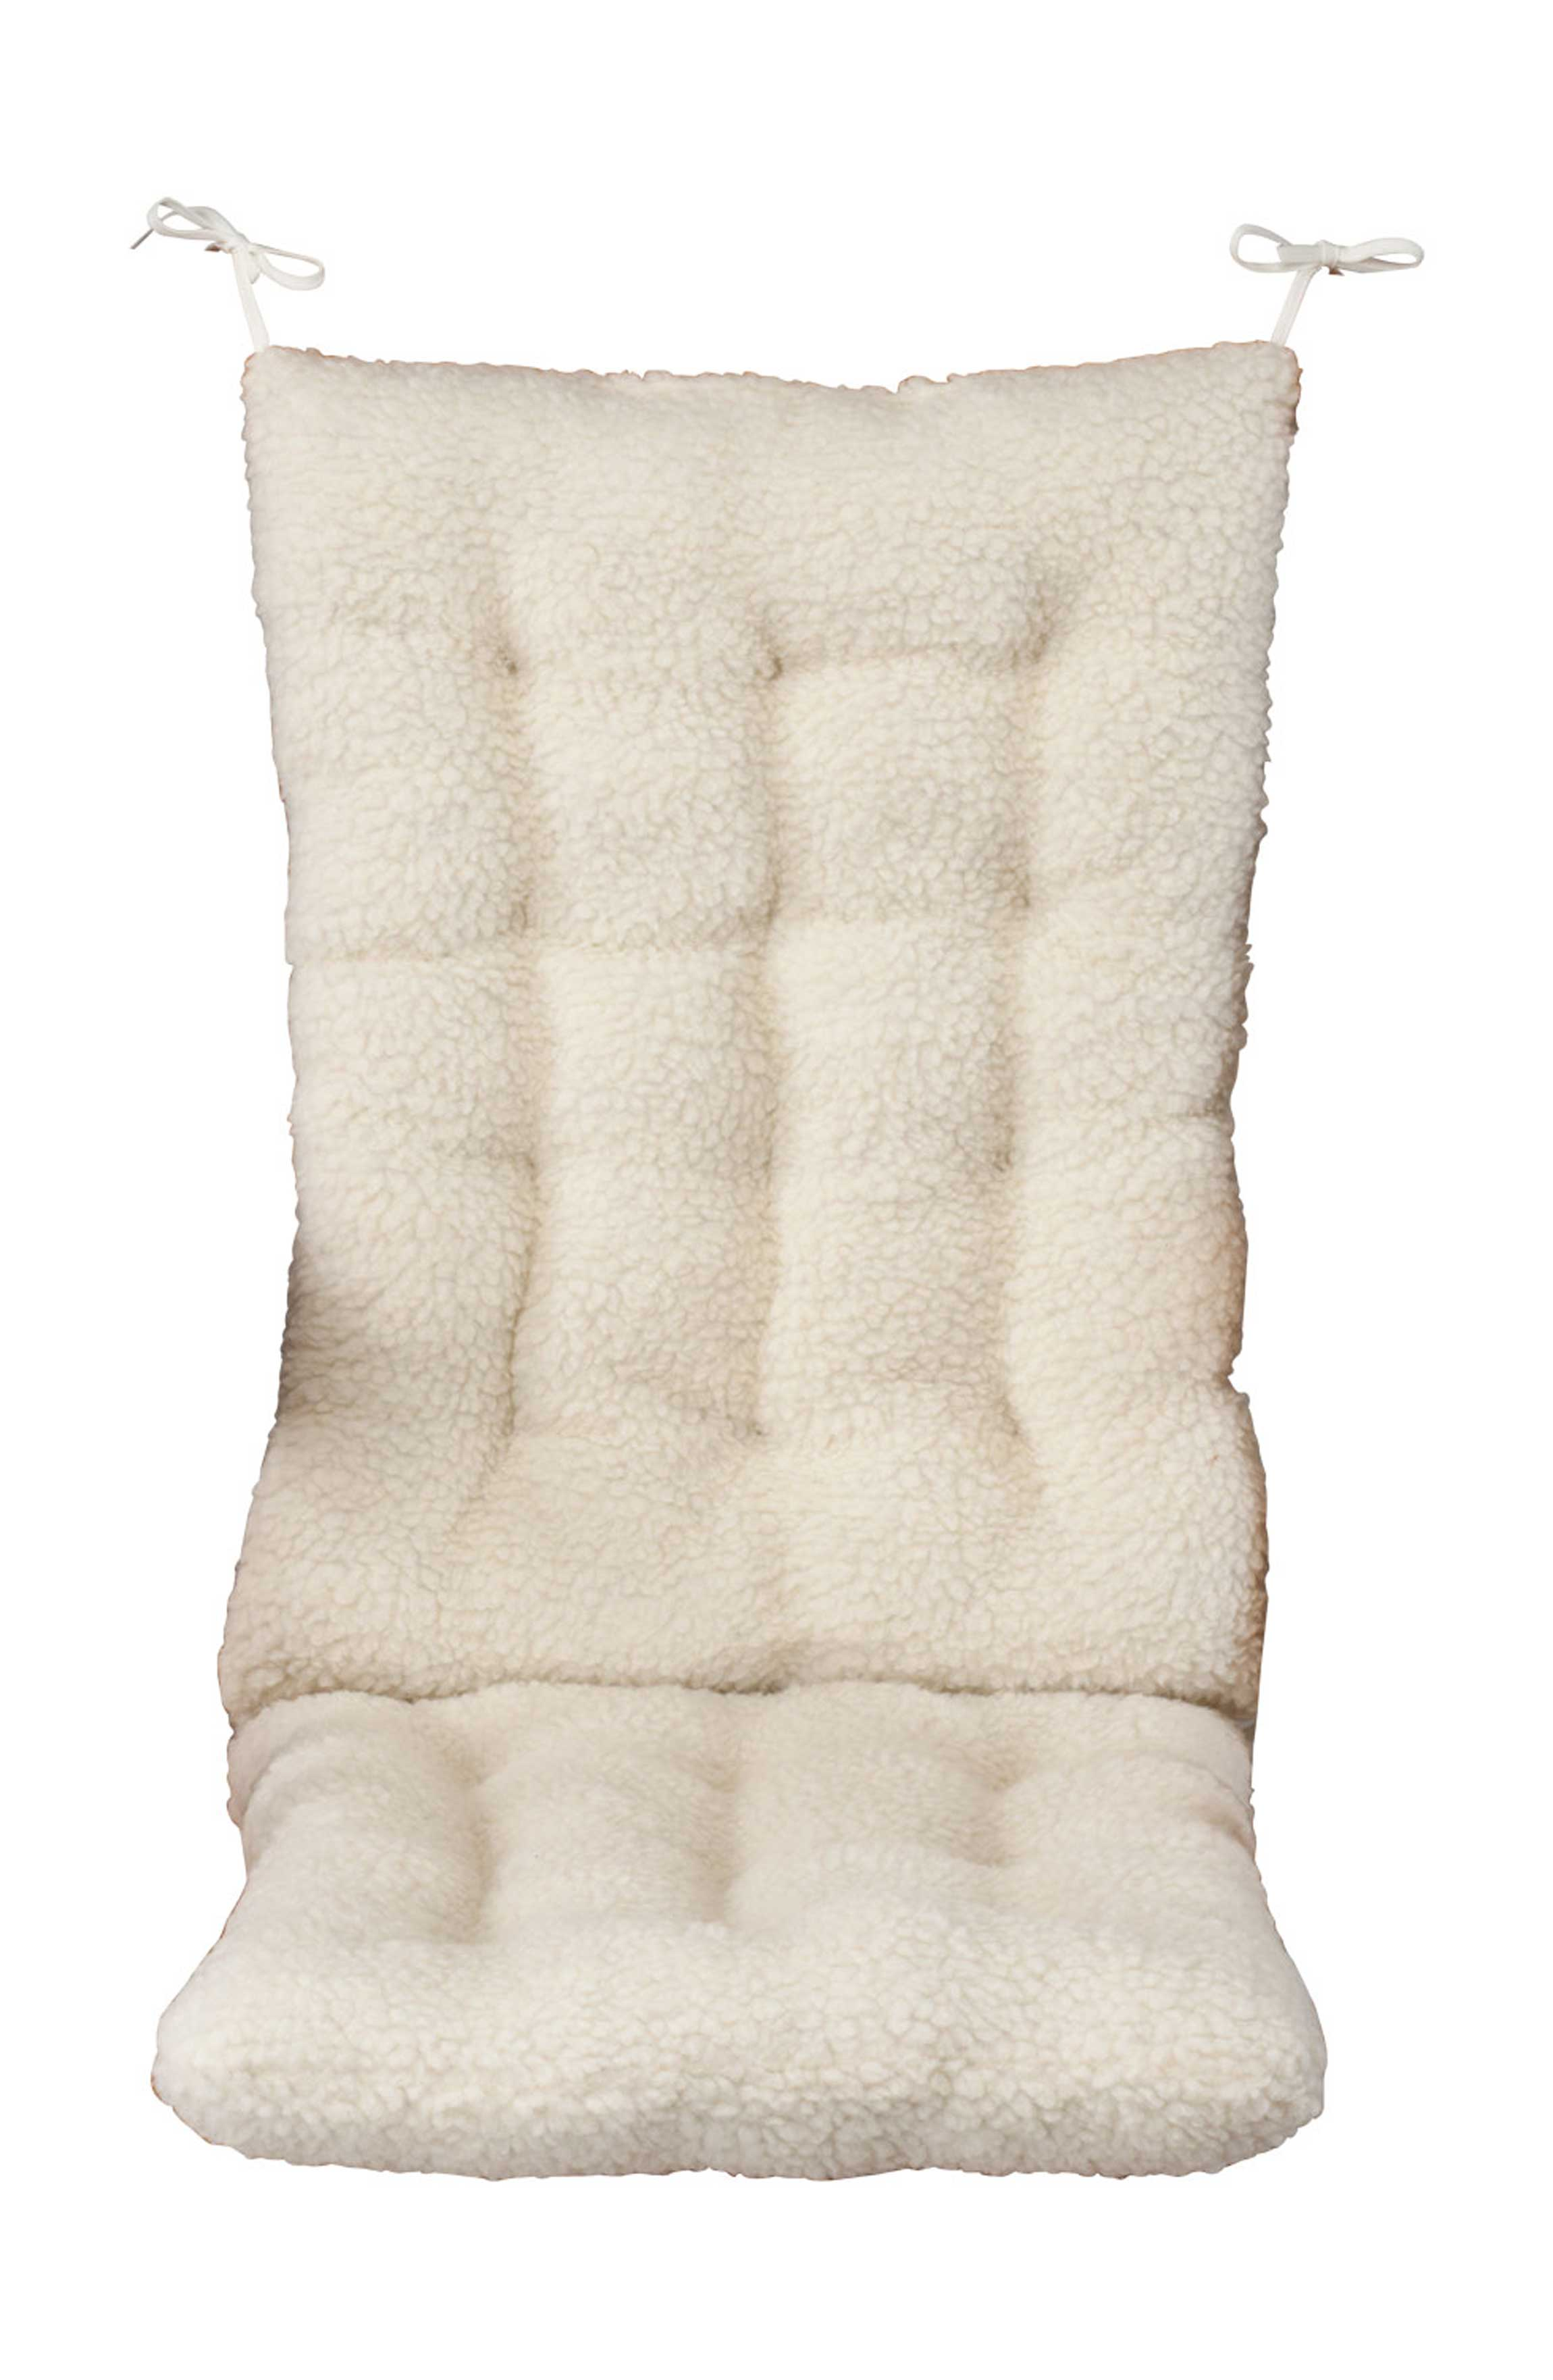 rocking chair cushion covers staples turcotte luxura high back executive brown sherpa set by oakridgetm ebay